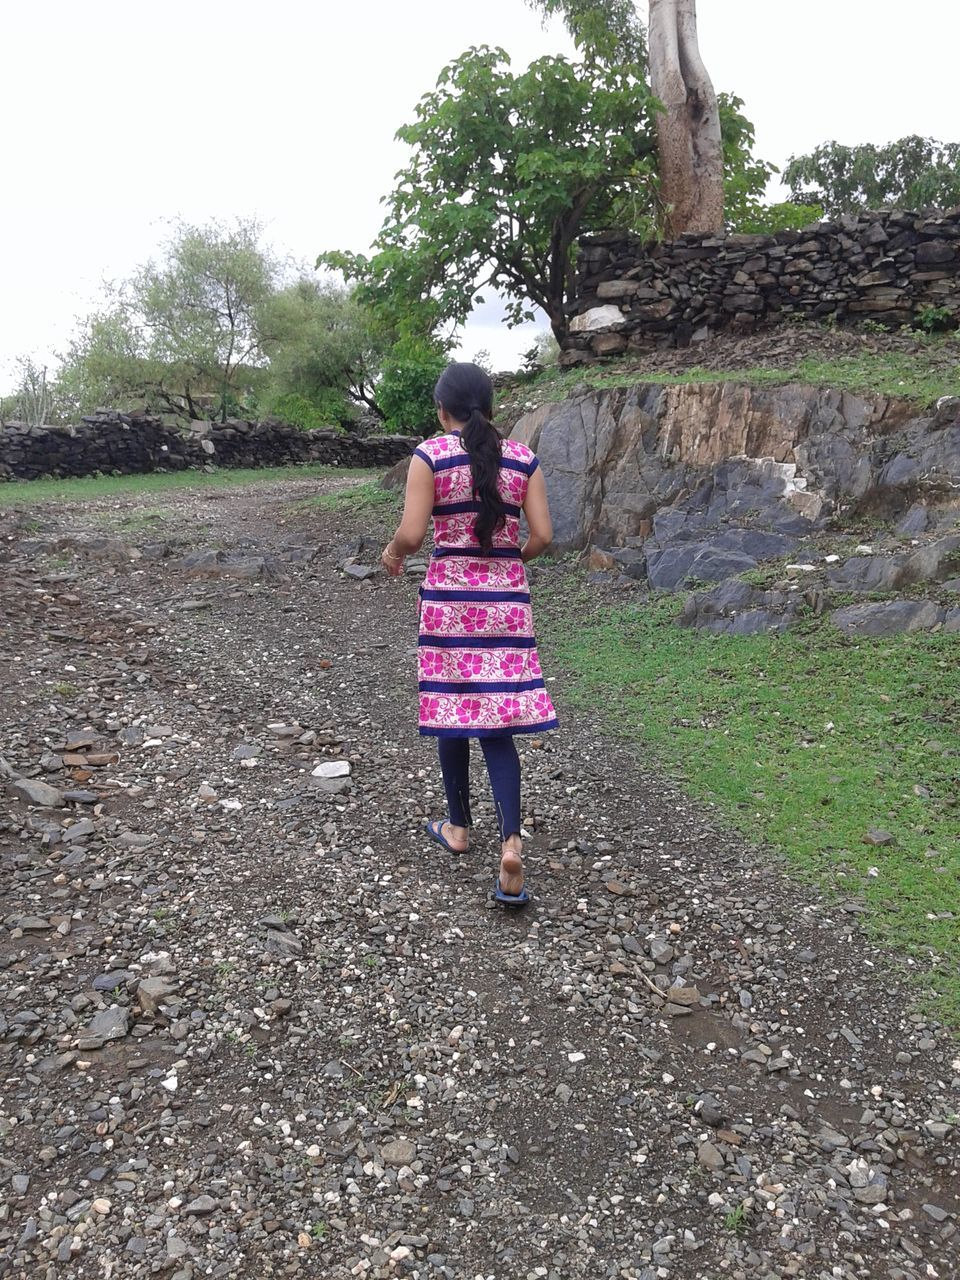 Rear View Of Woman Walking On Dirt Road